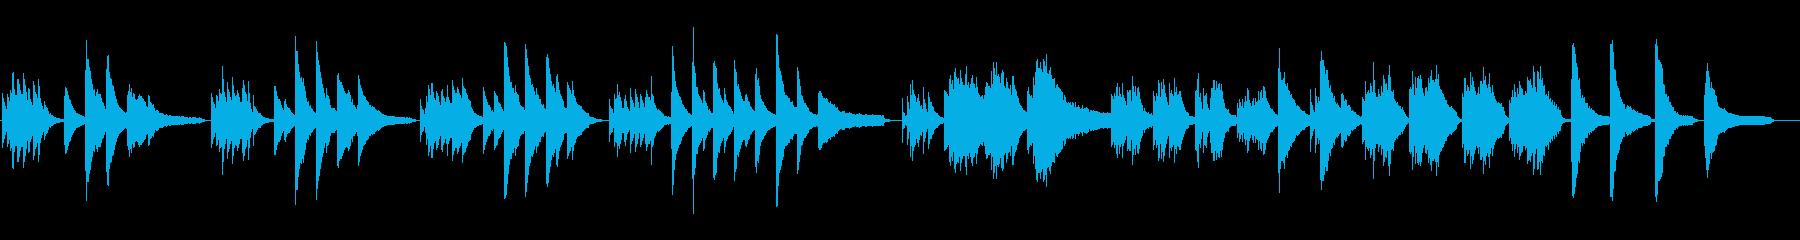 KANTピアノソロ2疑問と鬱の再生済みの波形